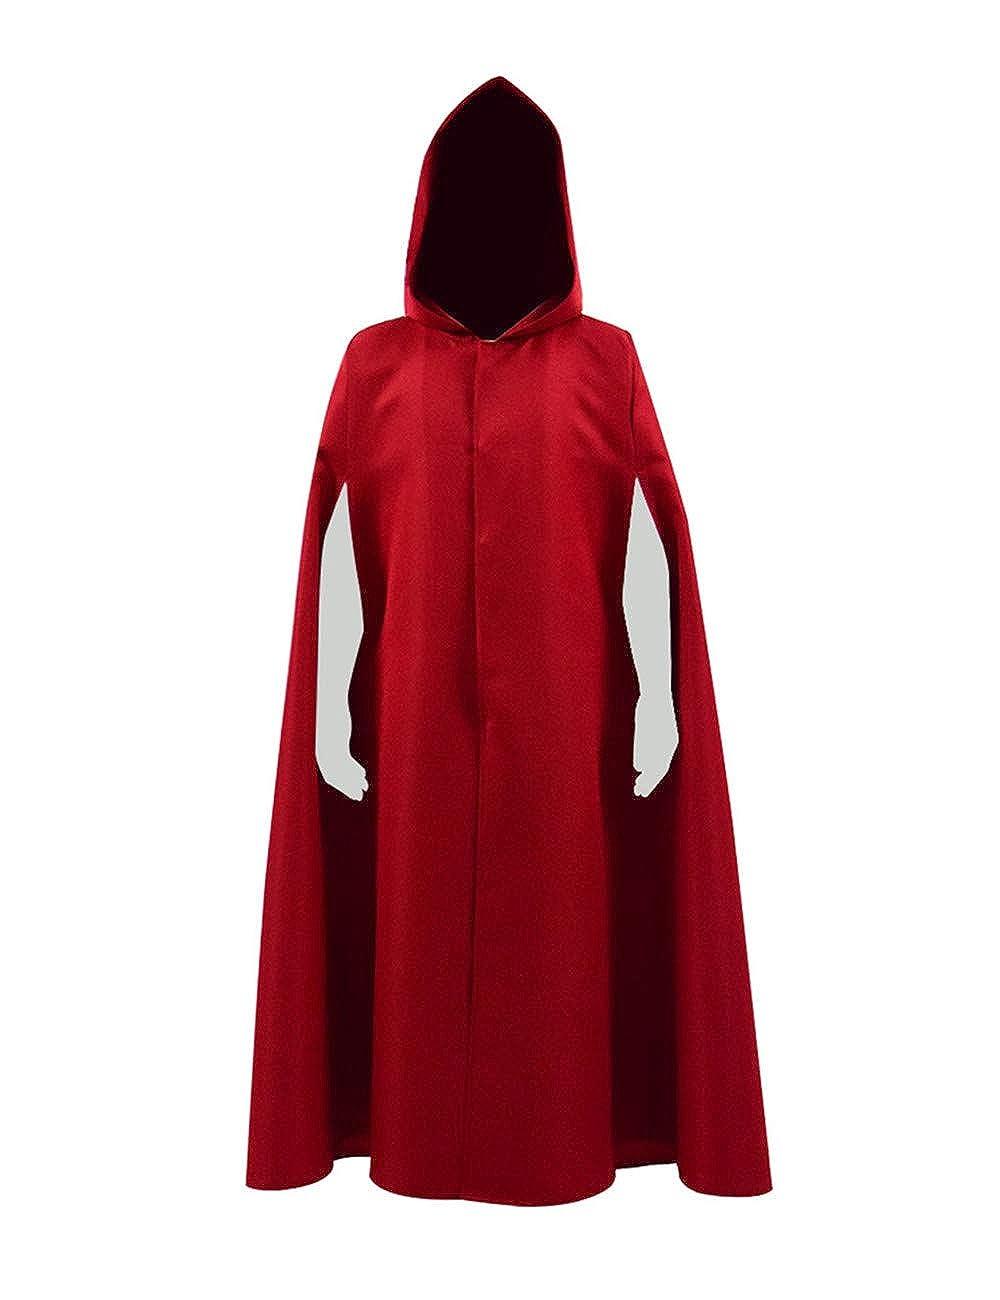 Expeke Halloween Party Women Handmaid Red Cape Dress Costume